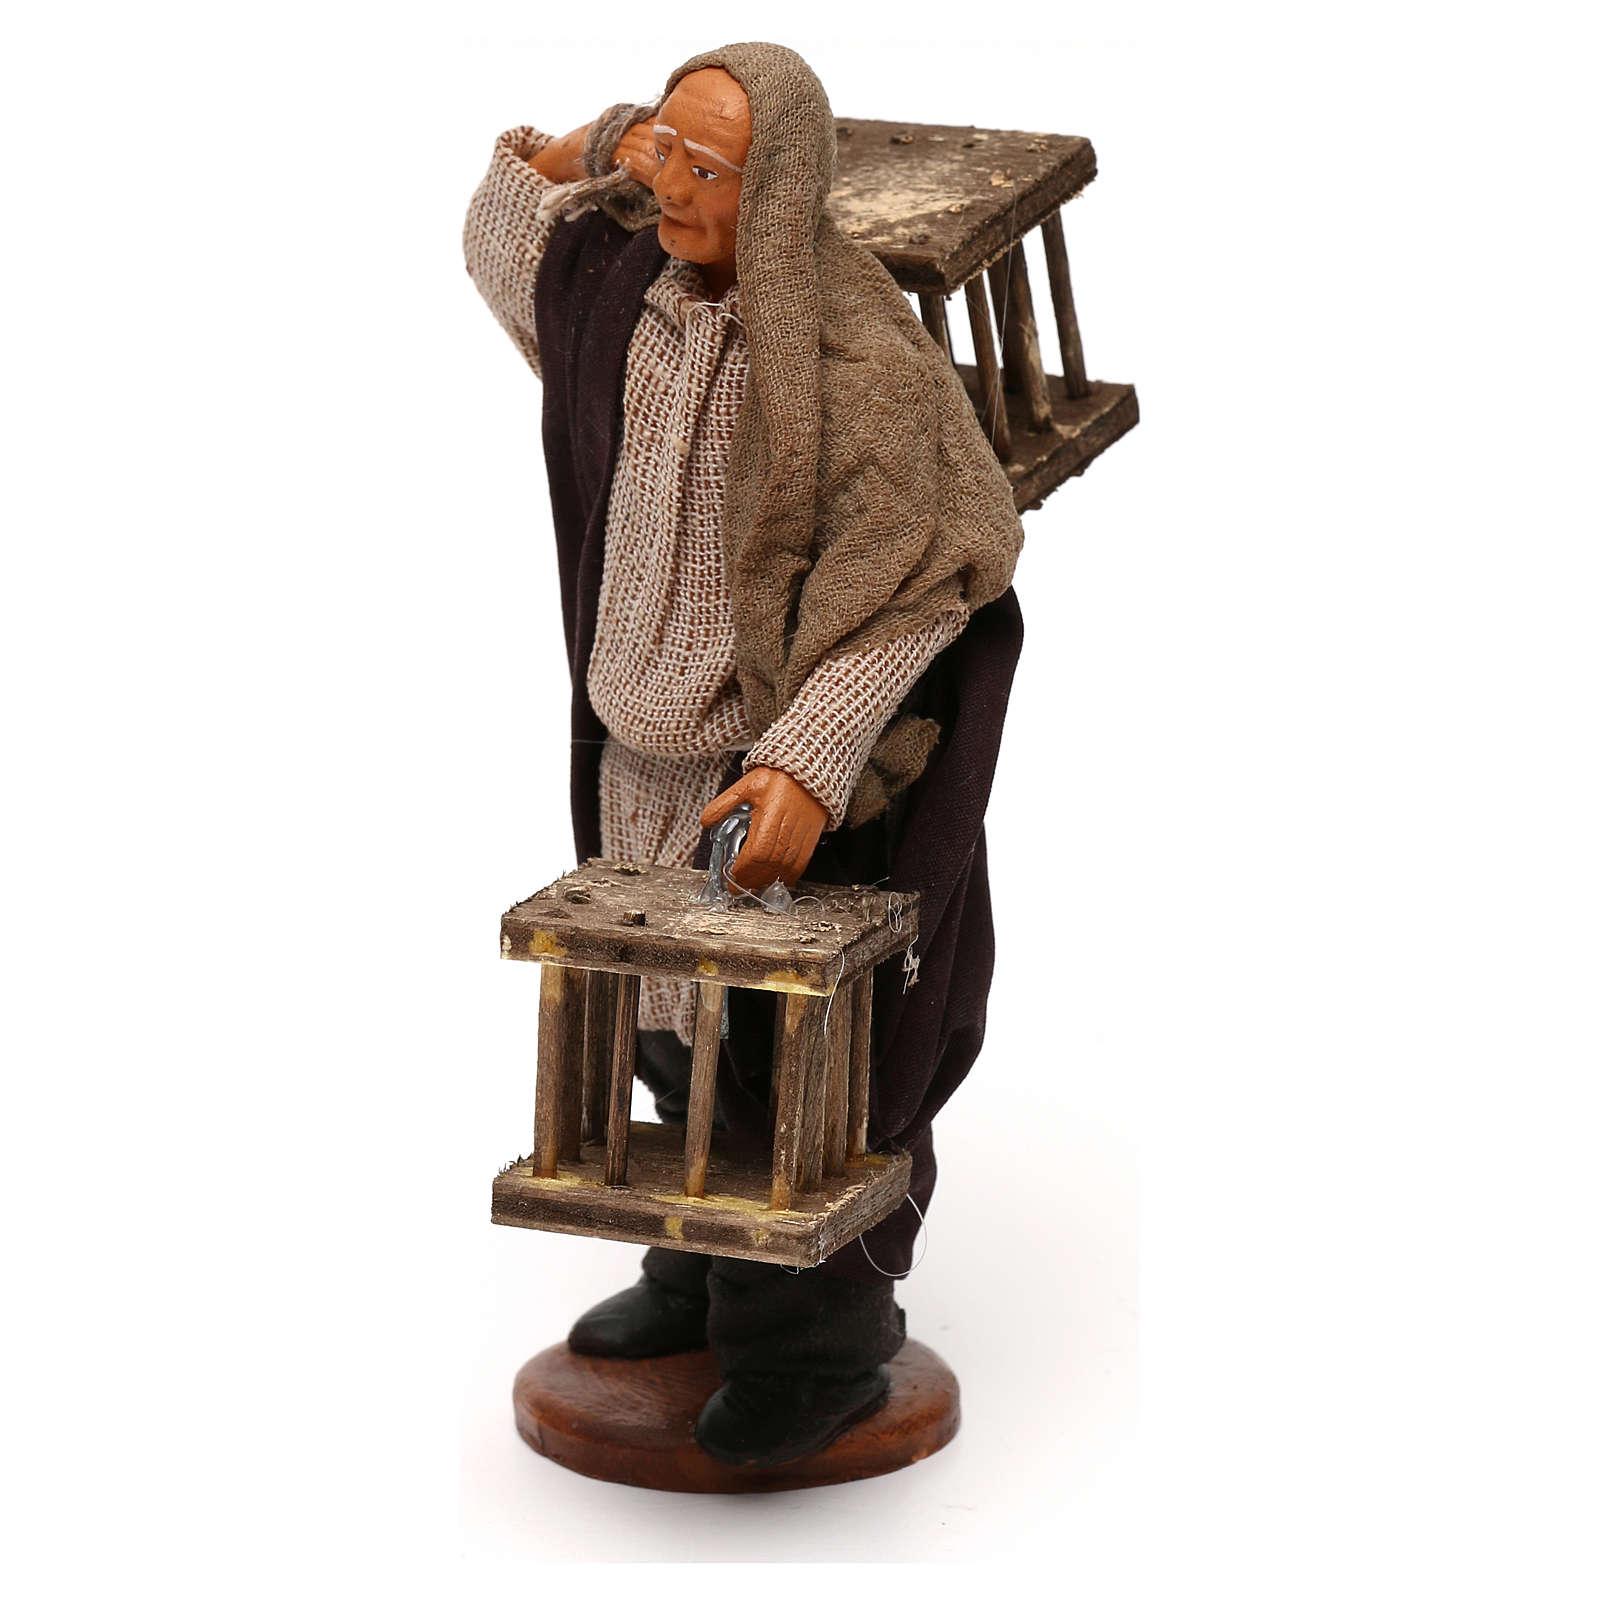 Uomo 2 gabbie legno presepe napoletano 12 cm 4